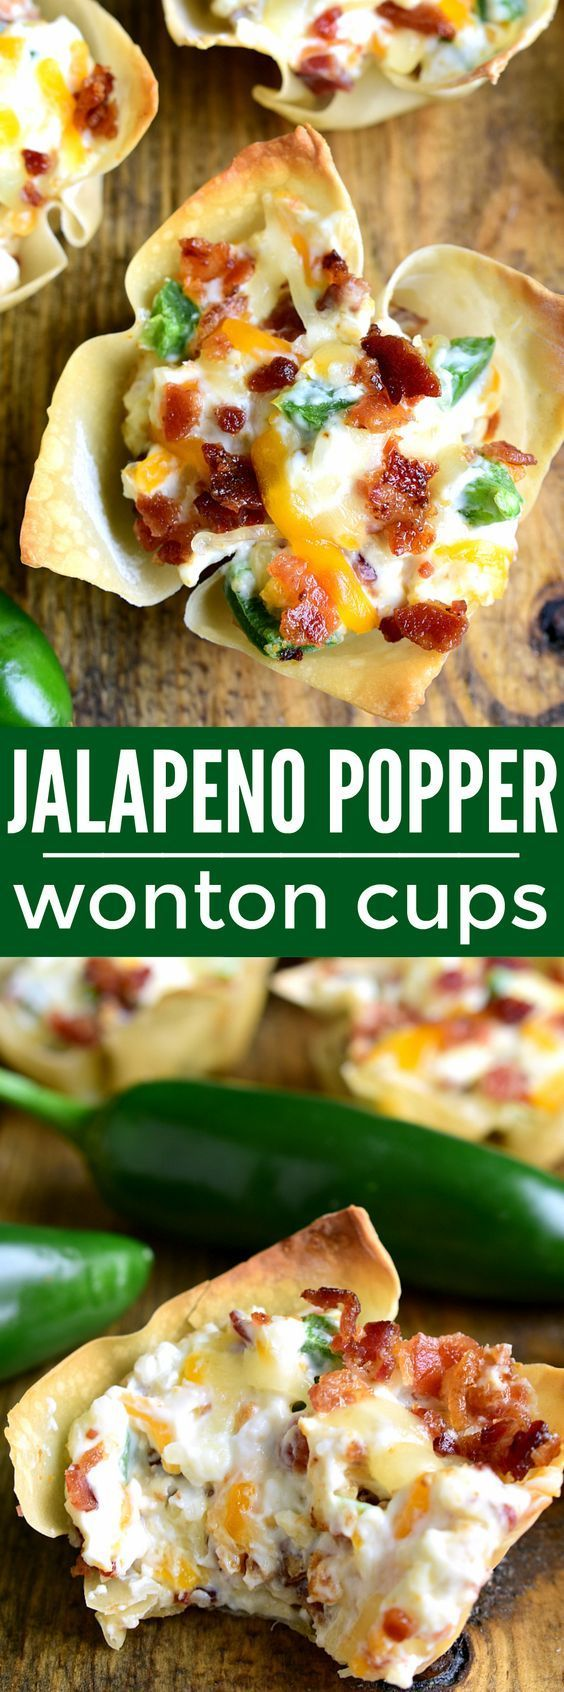 jalapeno popper wonton cups